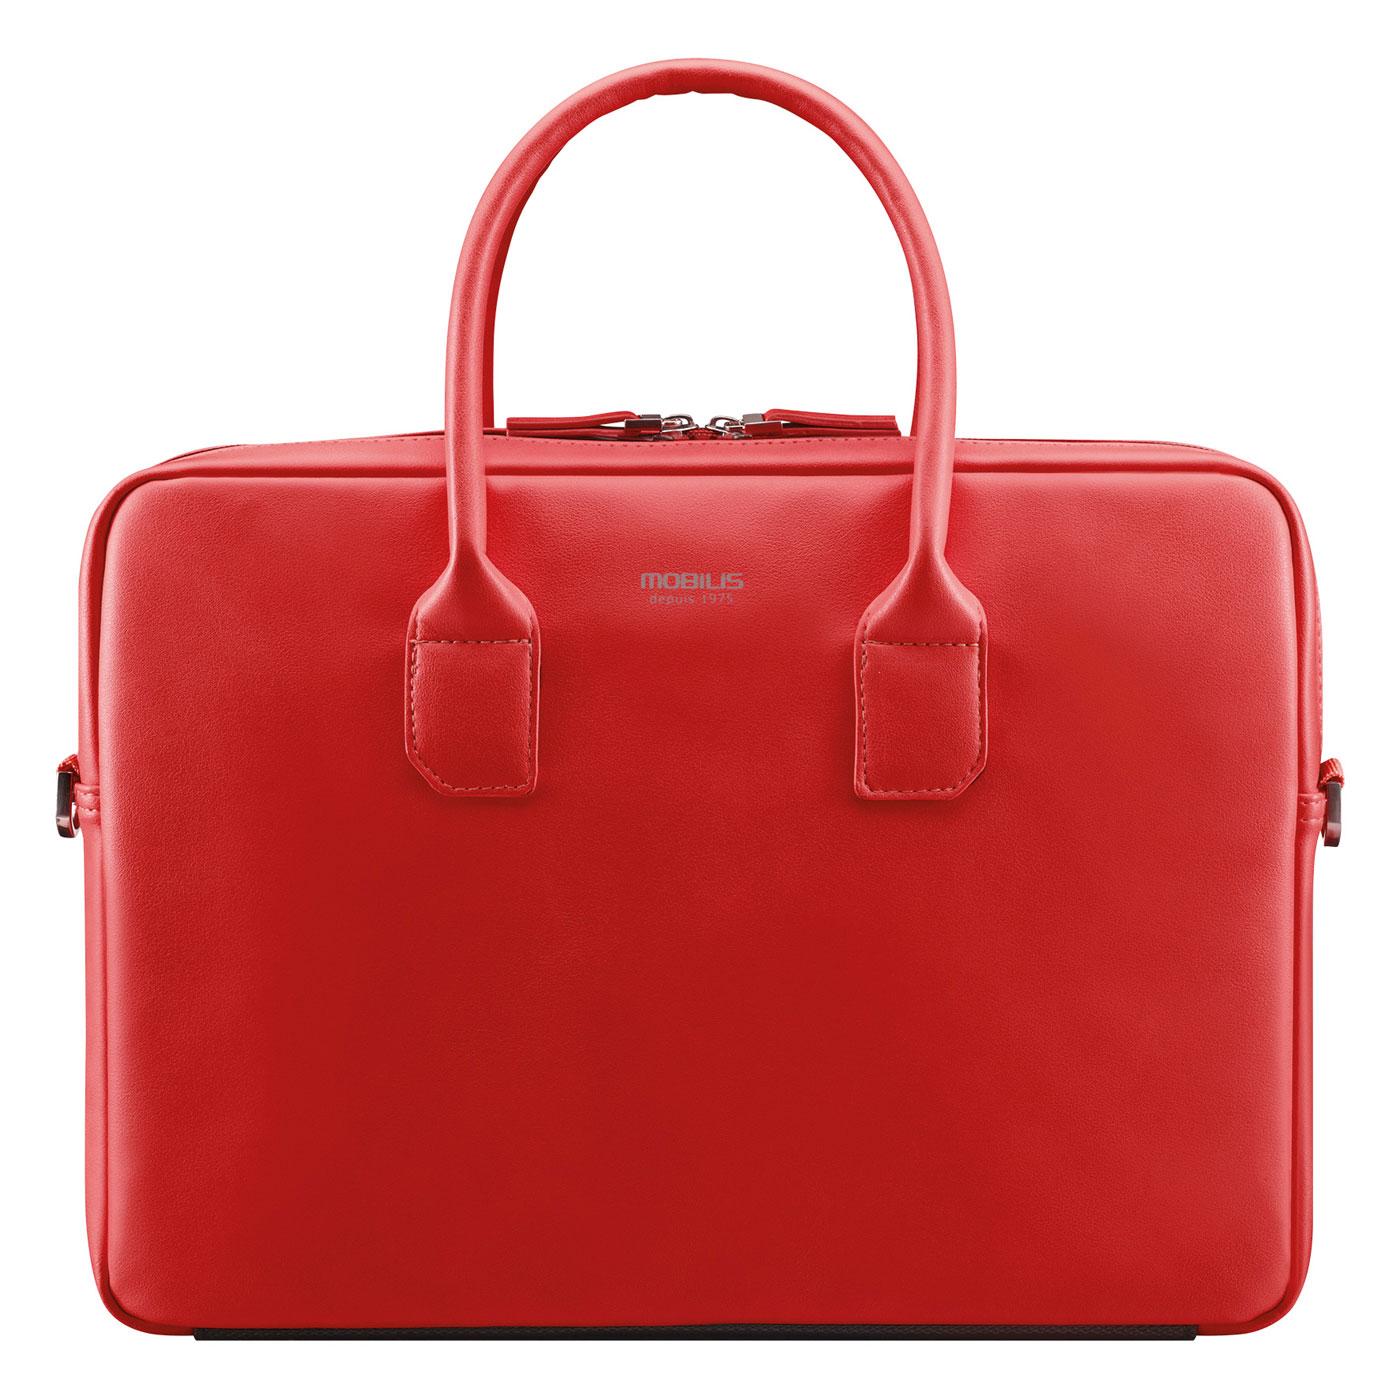 mobilis origine briefcase 14 16 rouge sac sacoche housse mobilis sur. Black Bedroom Furniture Sets. Home Design Ideas